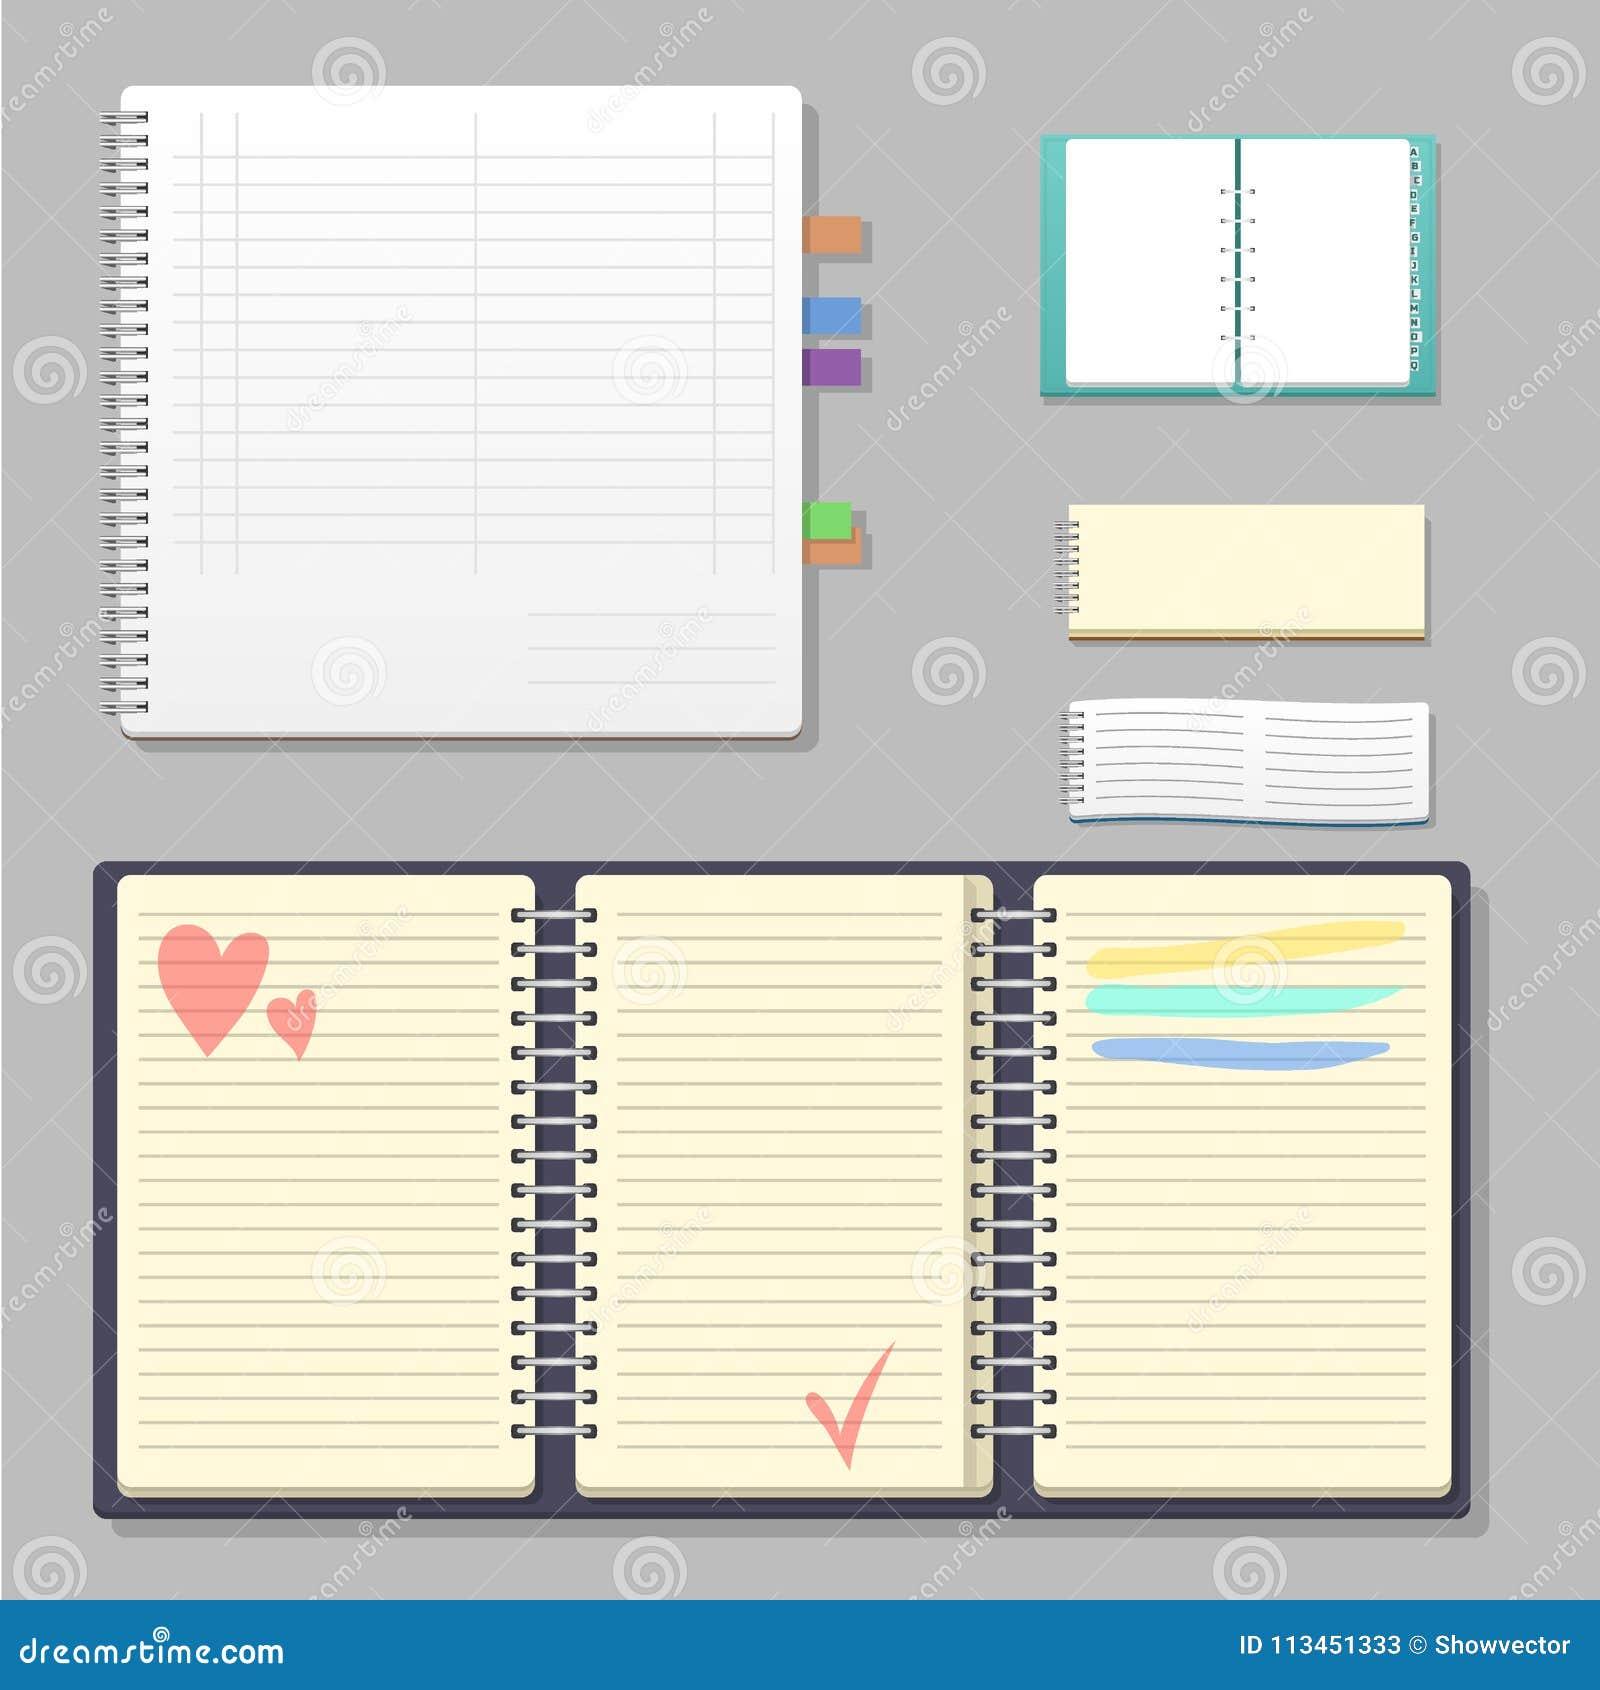 open office memo template